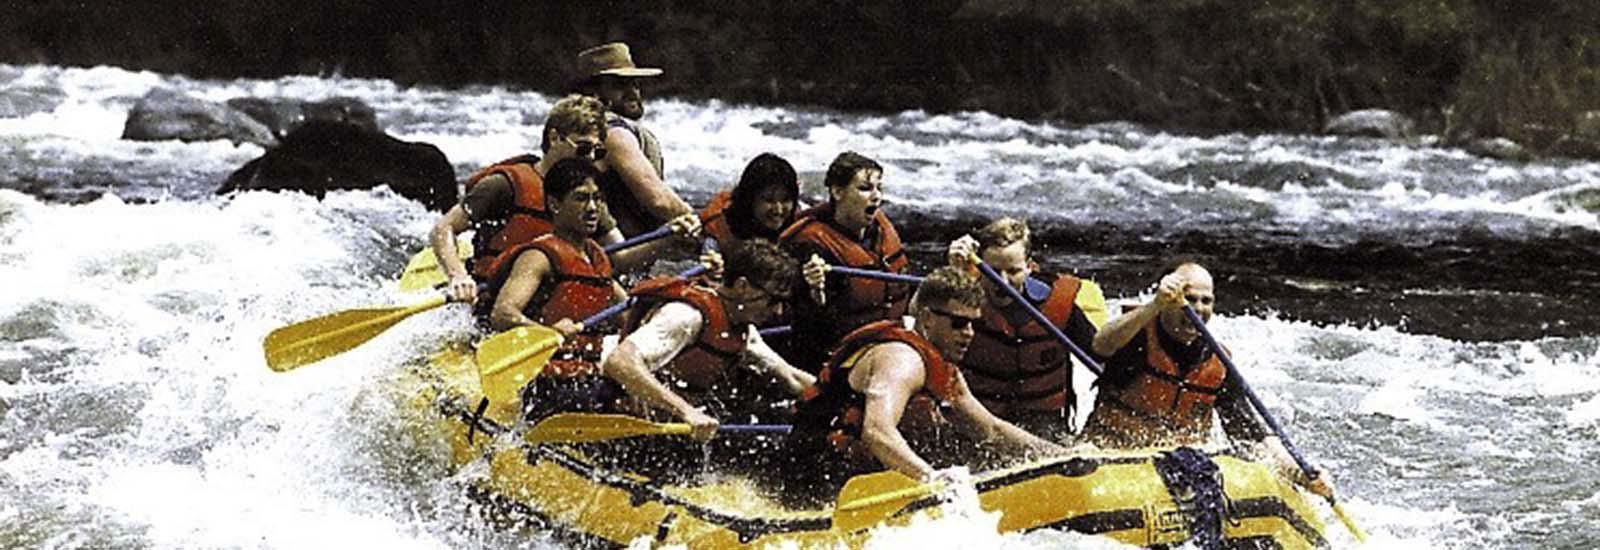 Rafting Skagit River